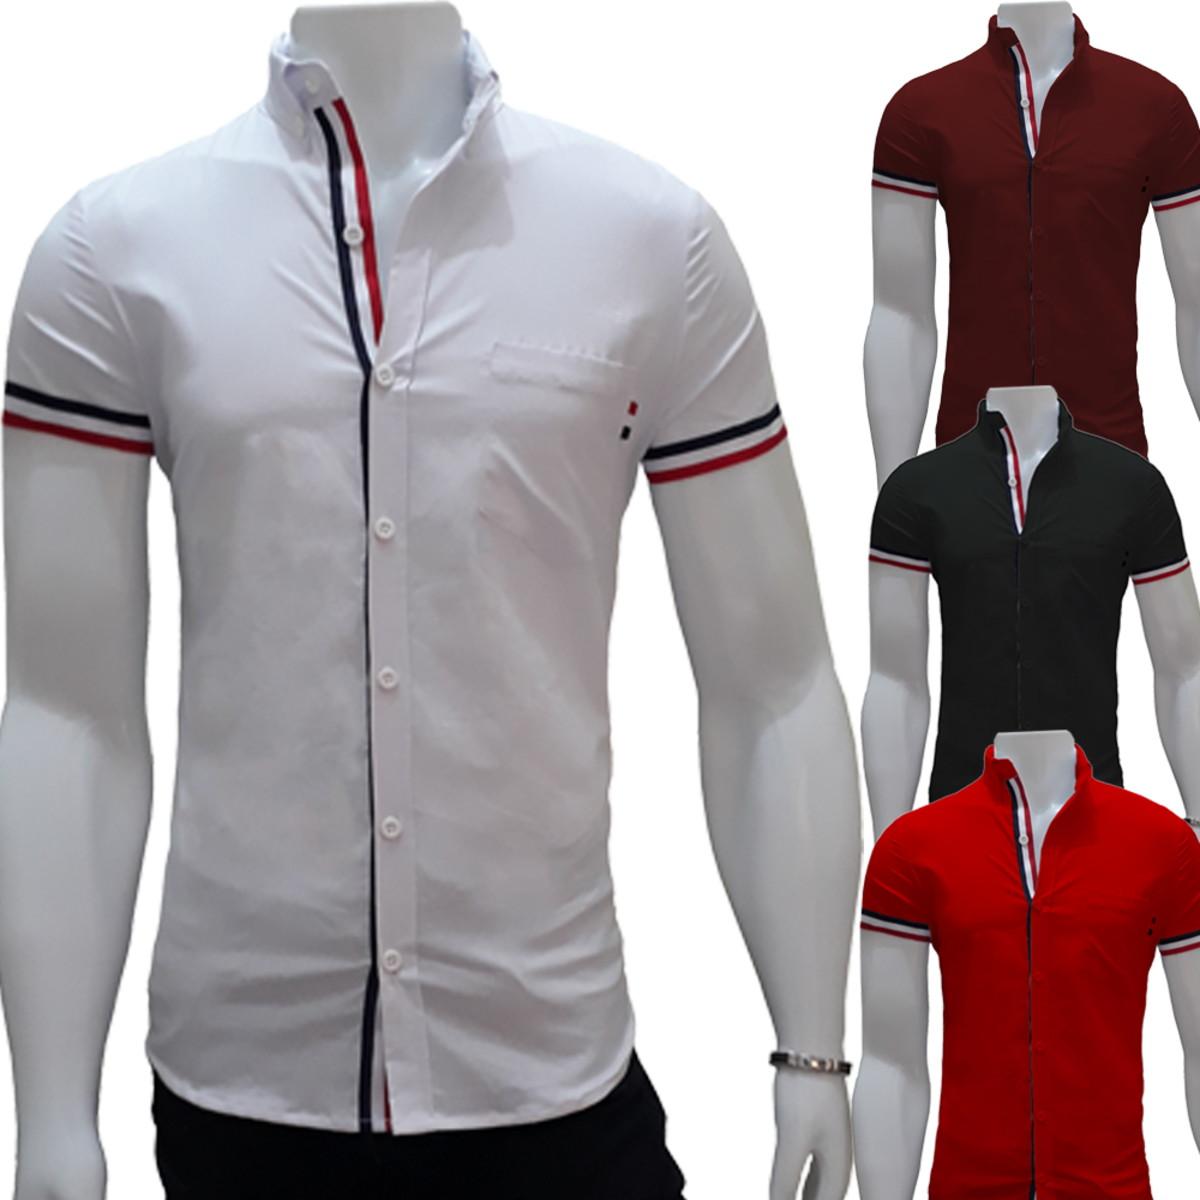 9628cd01b camisa social masculina slim fit manga curta moda jovem no Elo7 ...